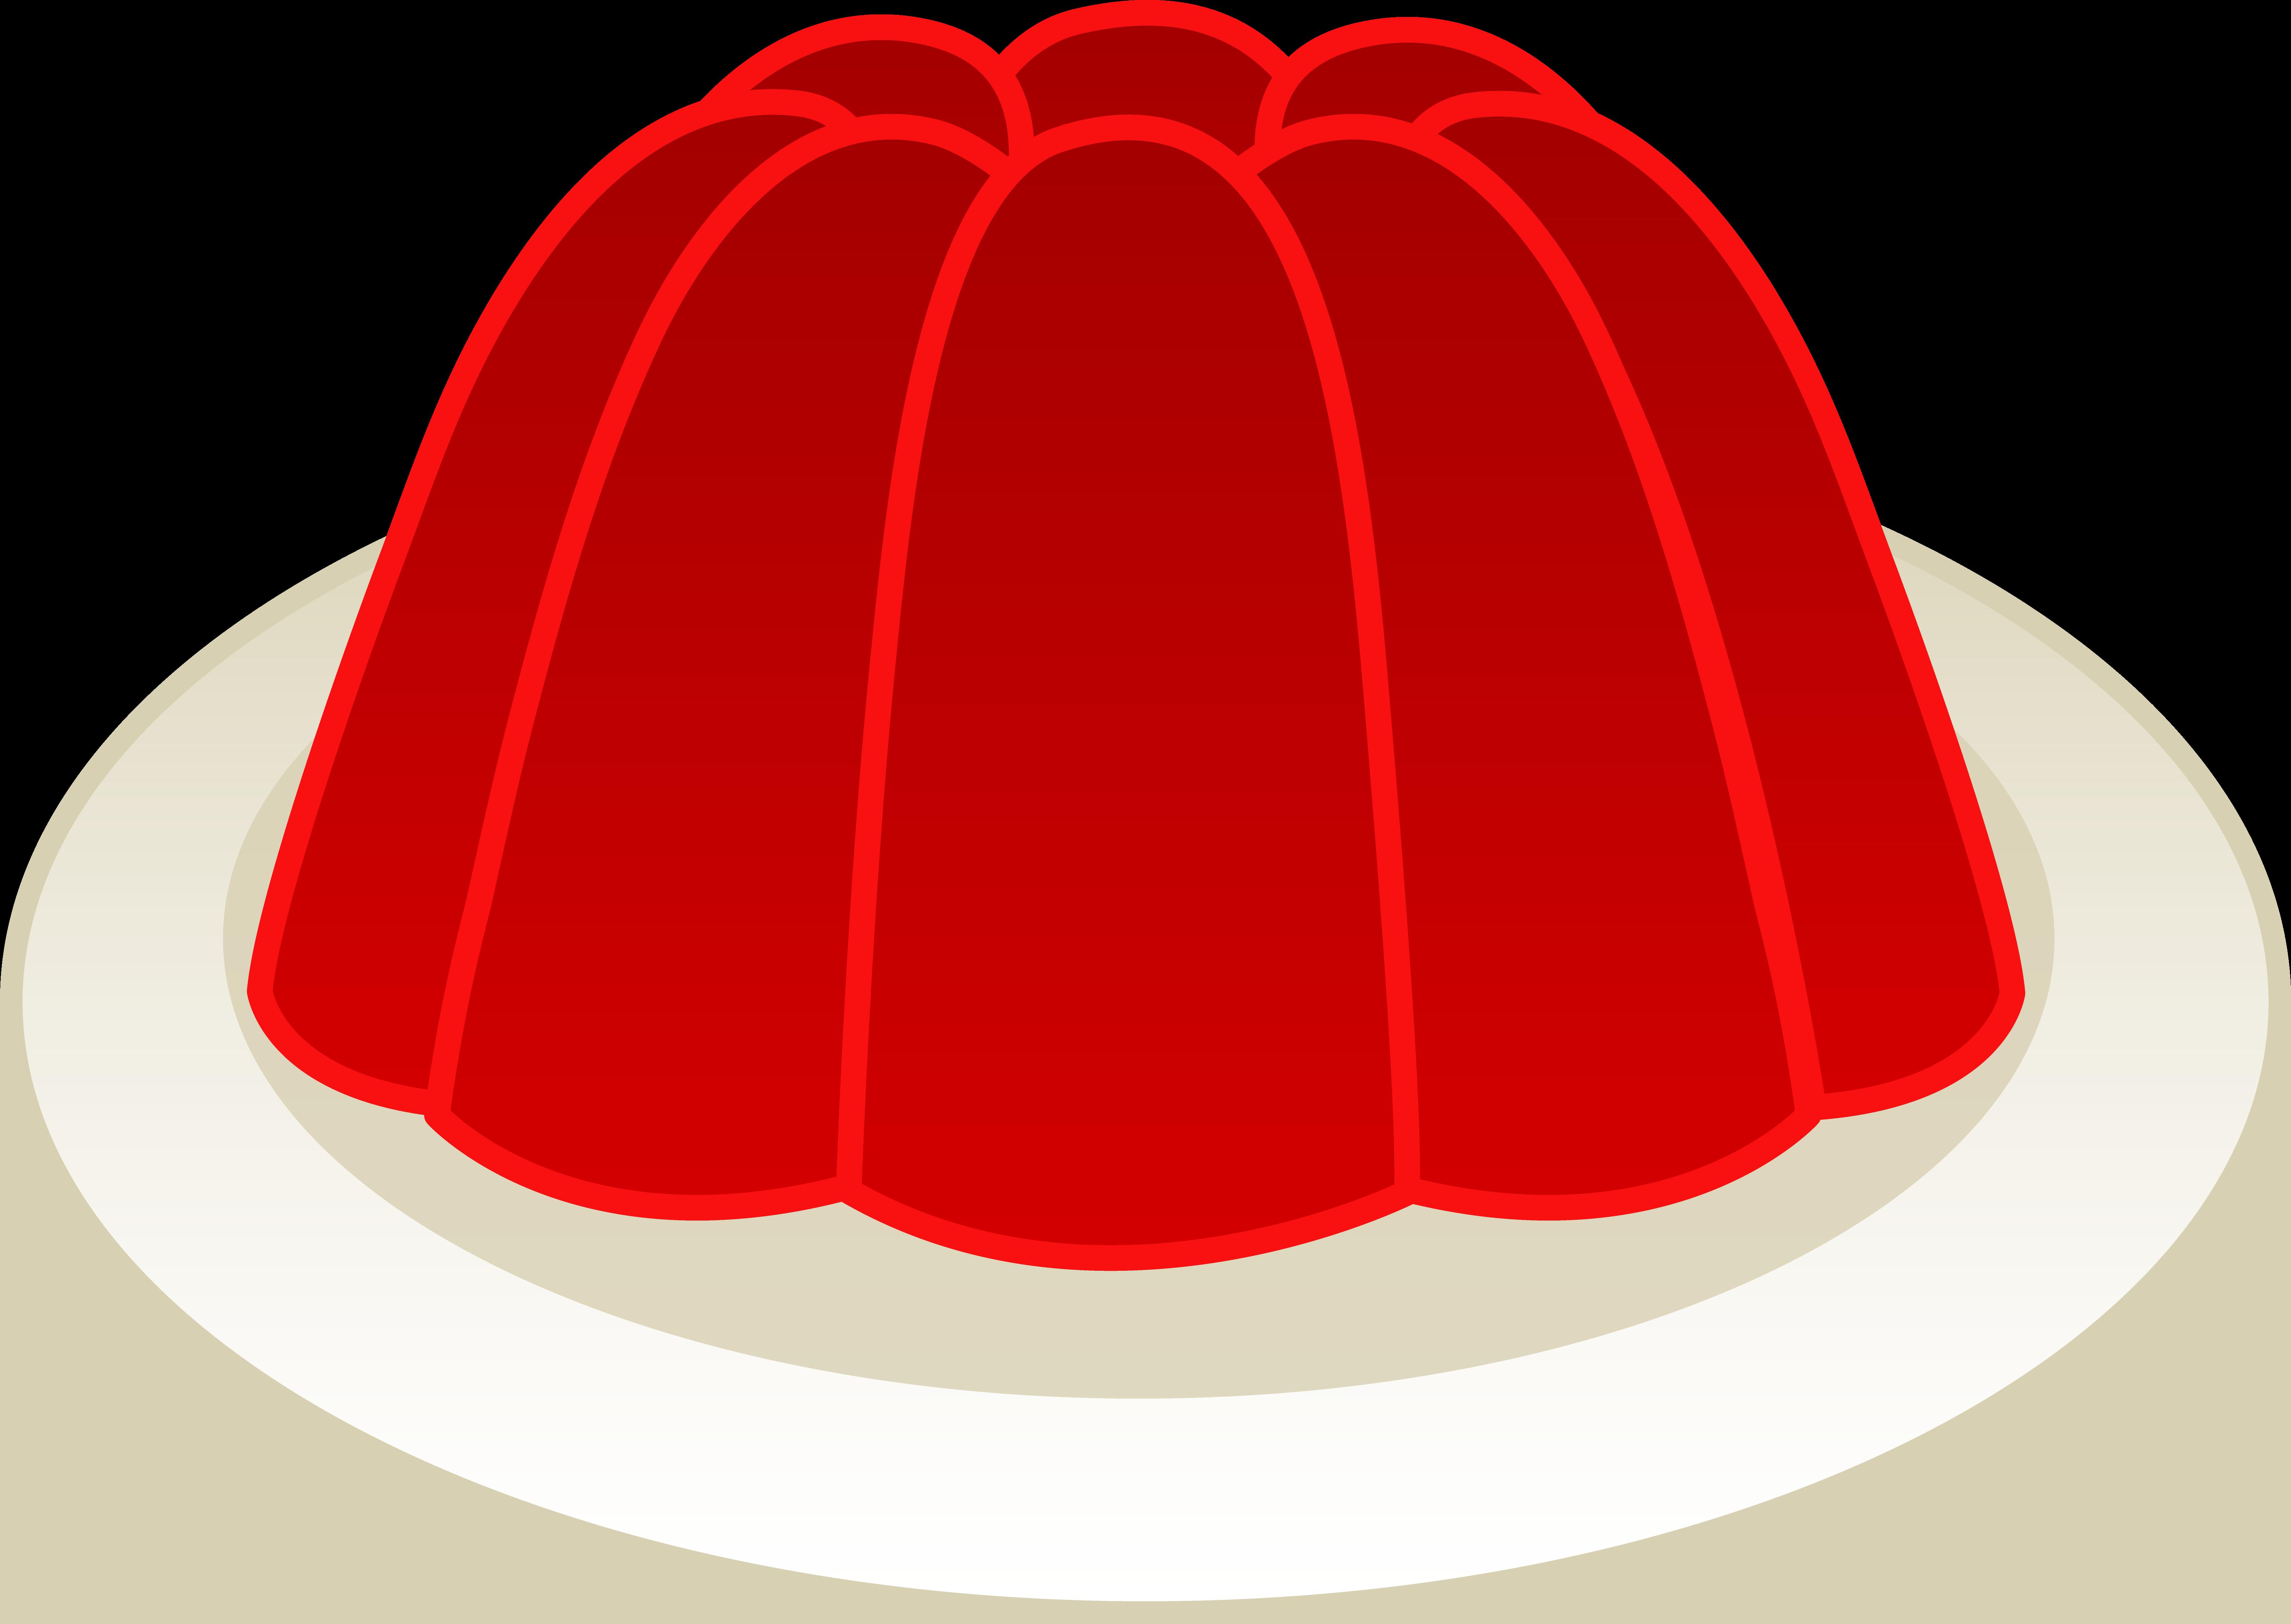 Jellyfish clipart vector. Red cherry gelatin mold